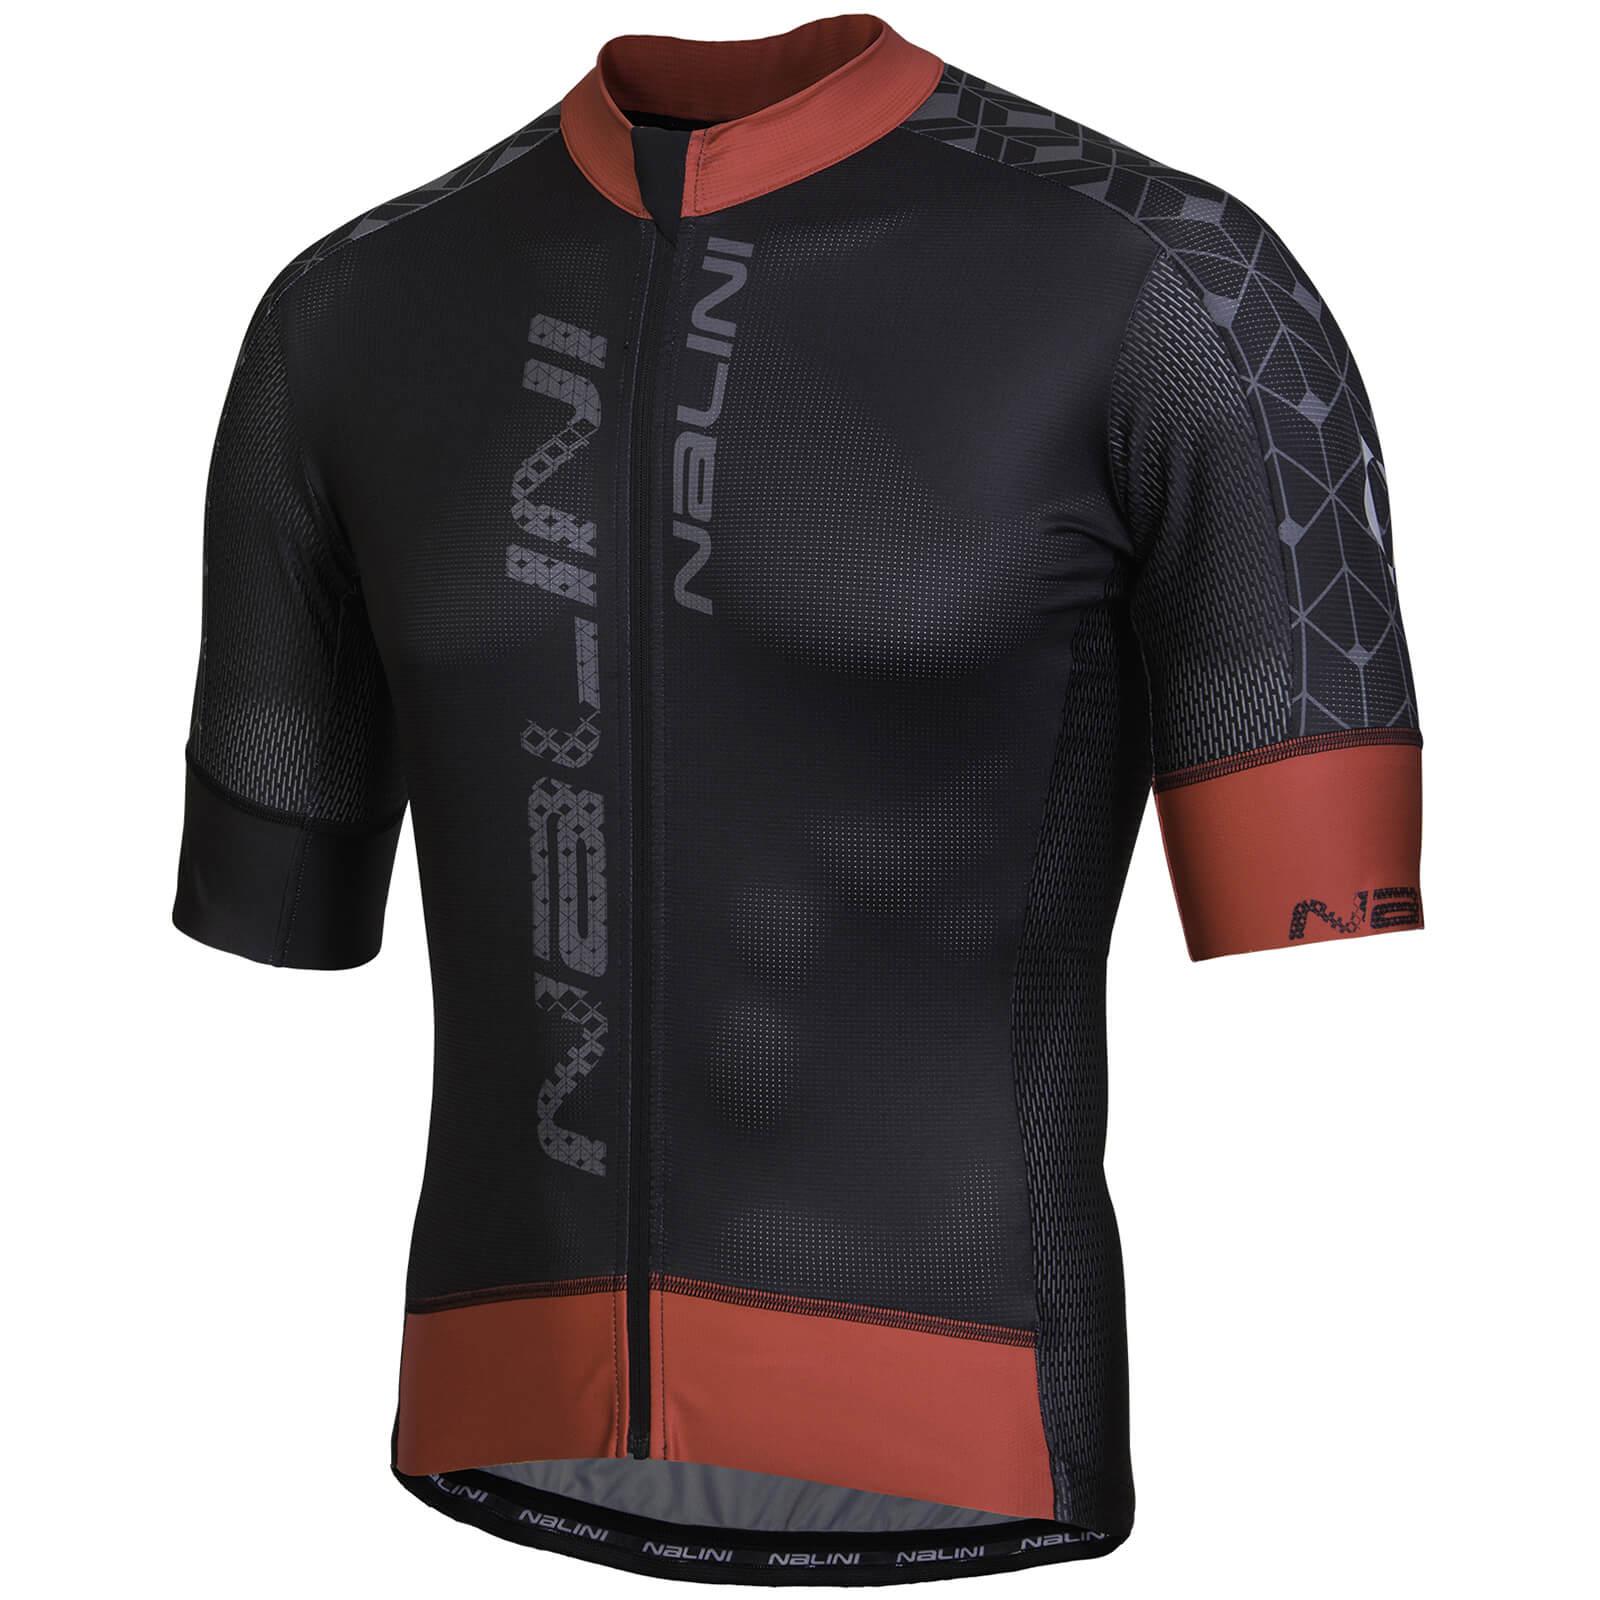 Nalini Velocita  Short Sleeve Jersey - Black Red  7b2a78f1d